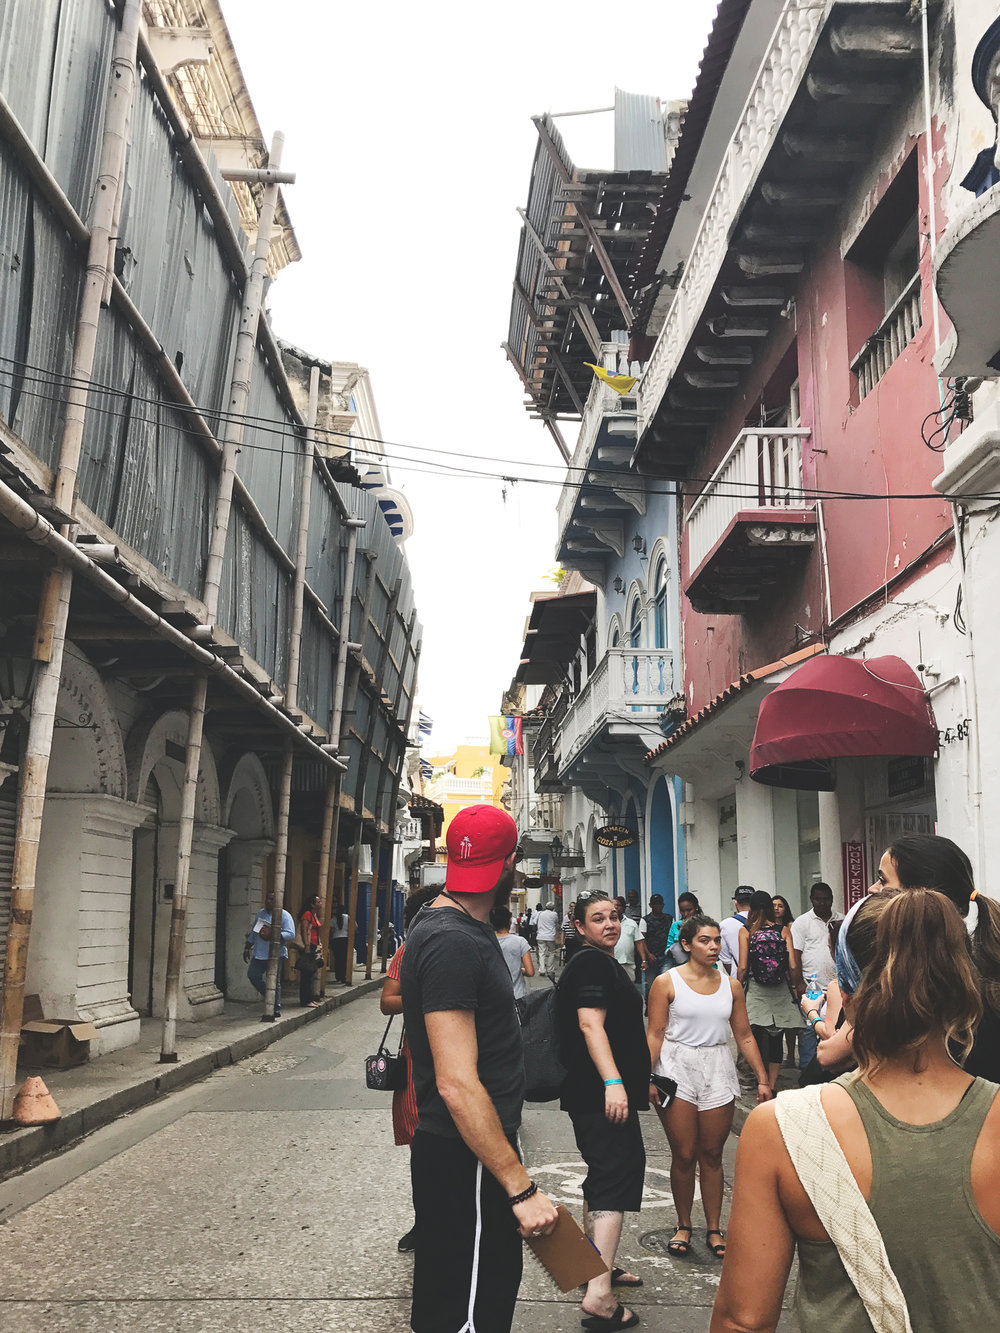 2017-Cartagena-LowRes-6.jpg